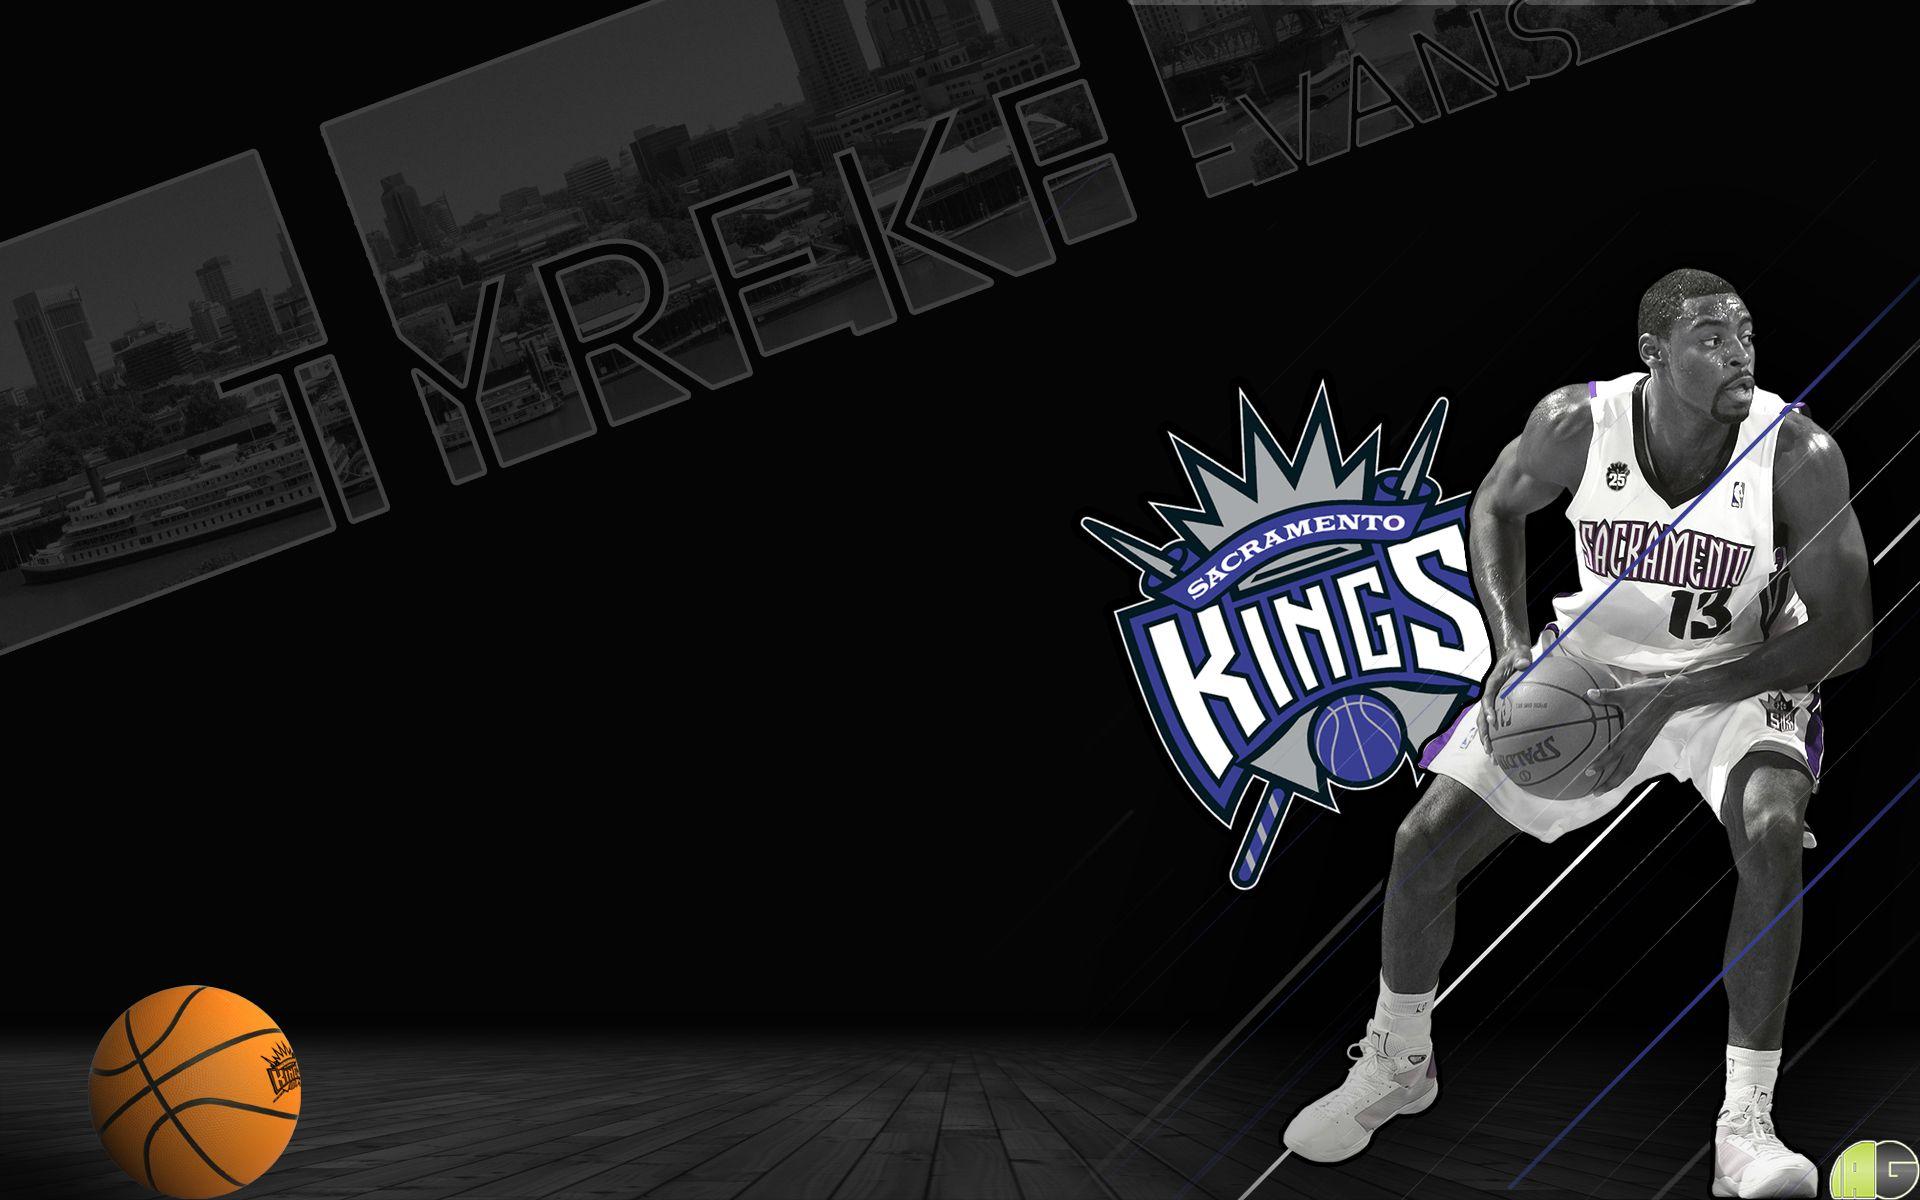 SACRAMENTO KINGS nba basketball 11 wallpaper 1920x1200 227715 1920x1200